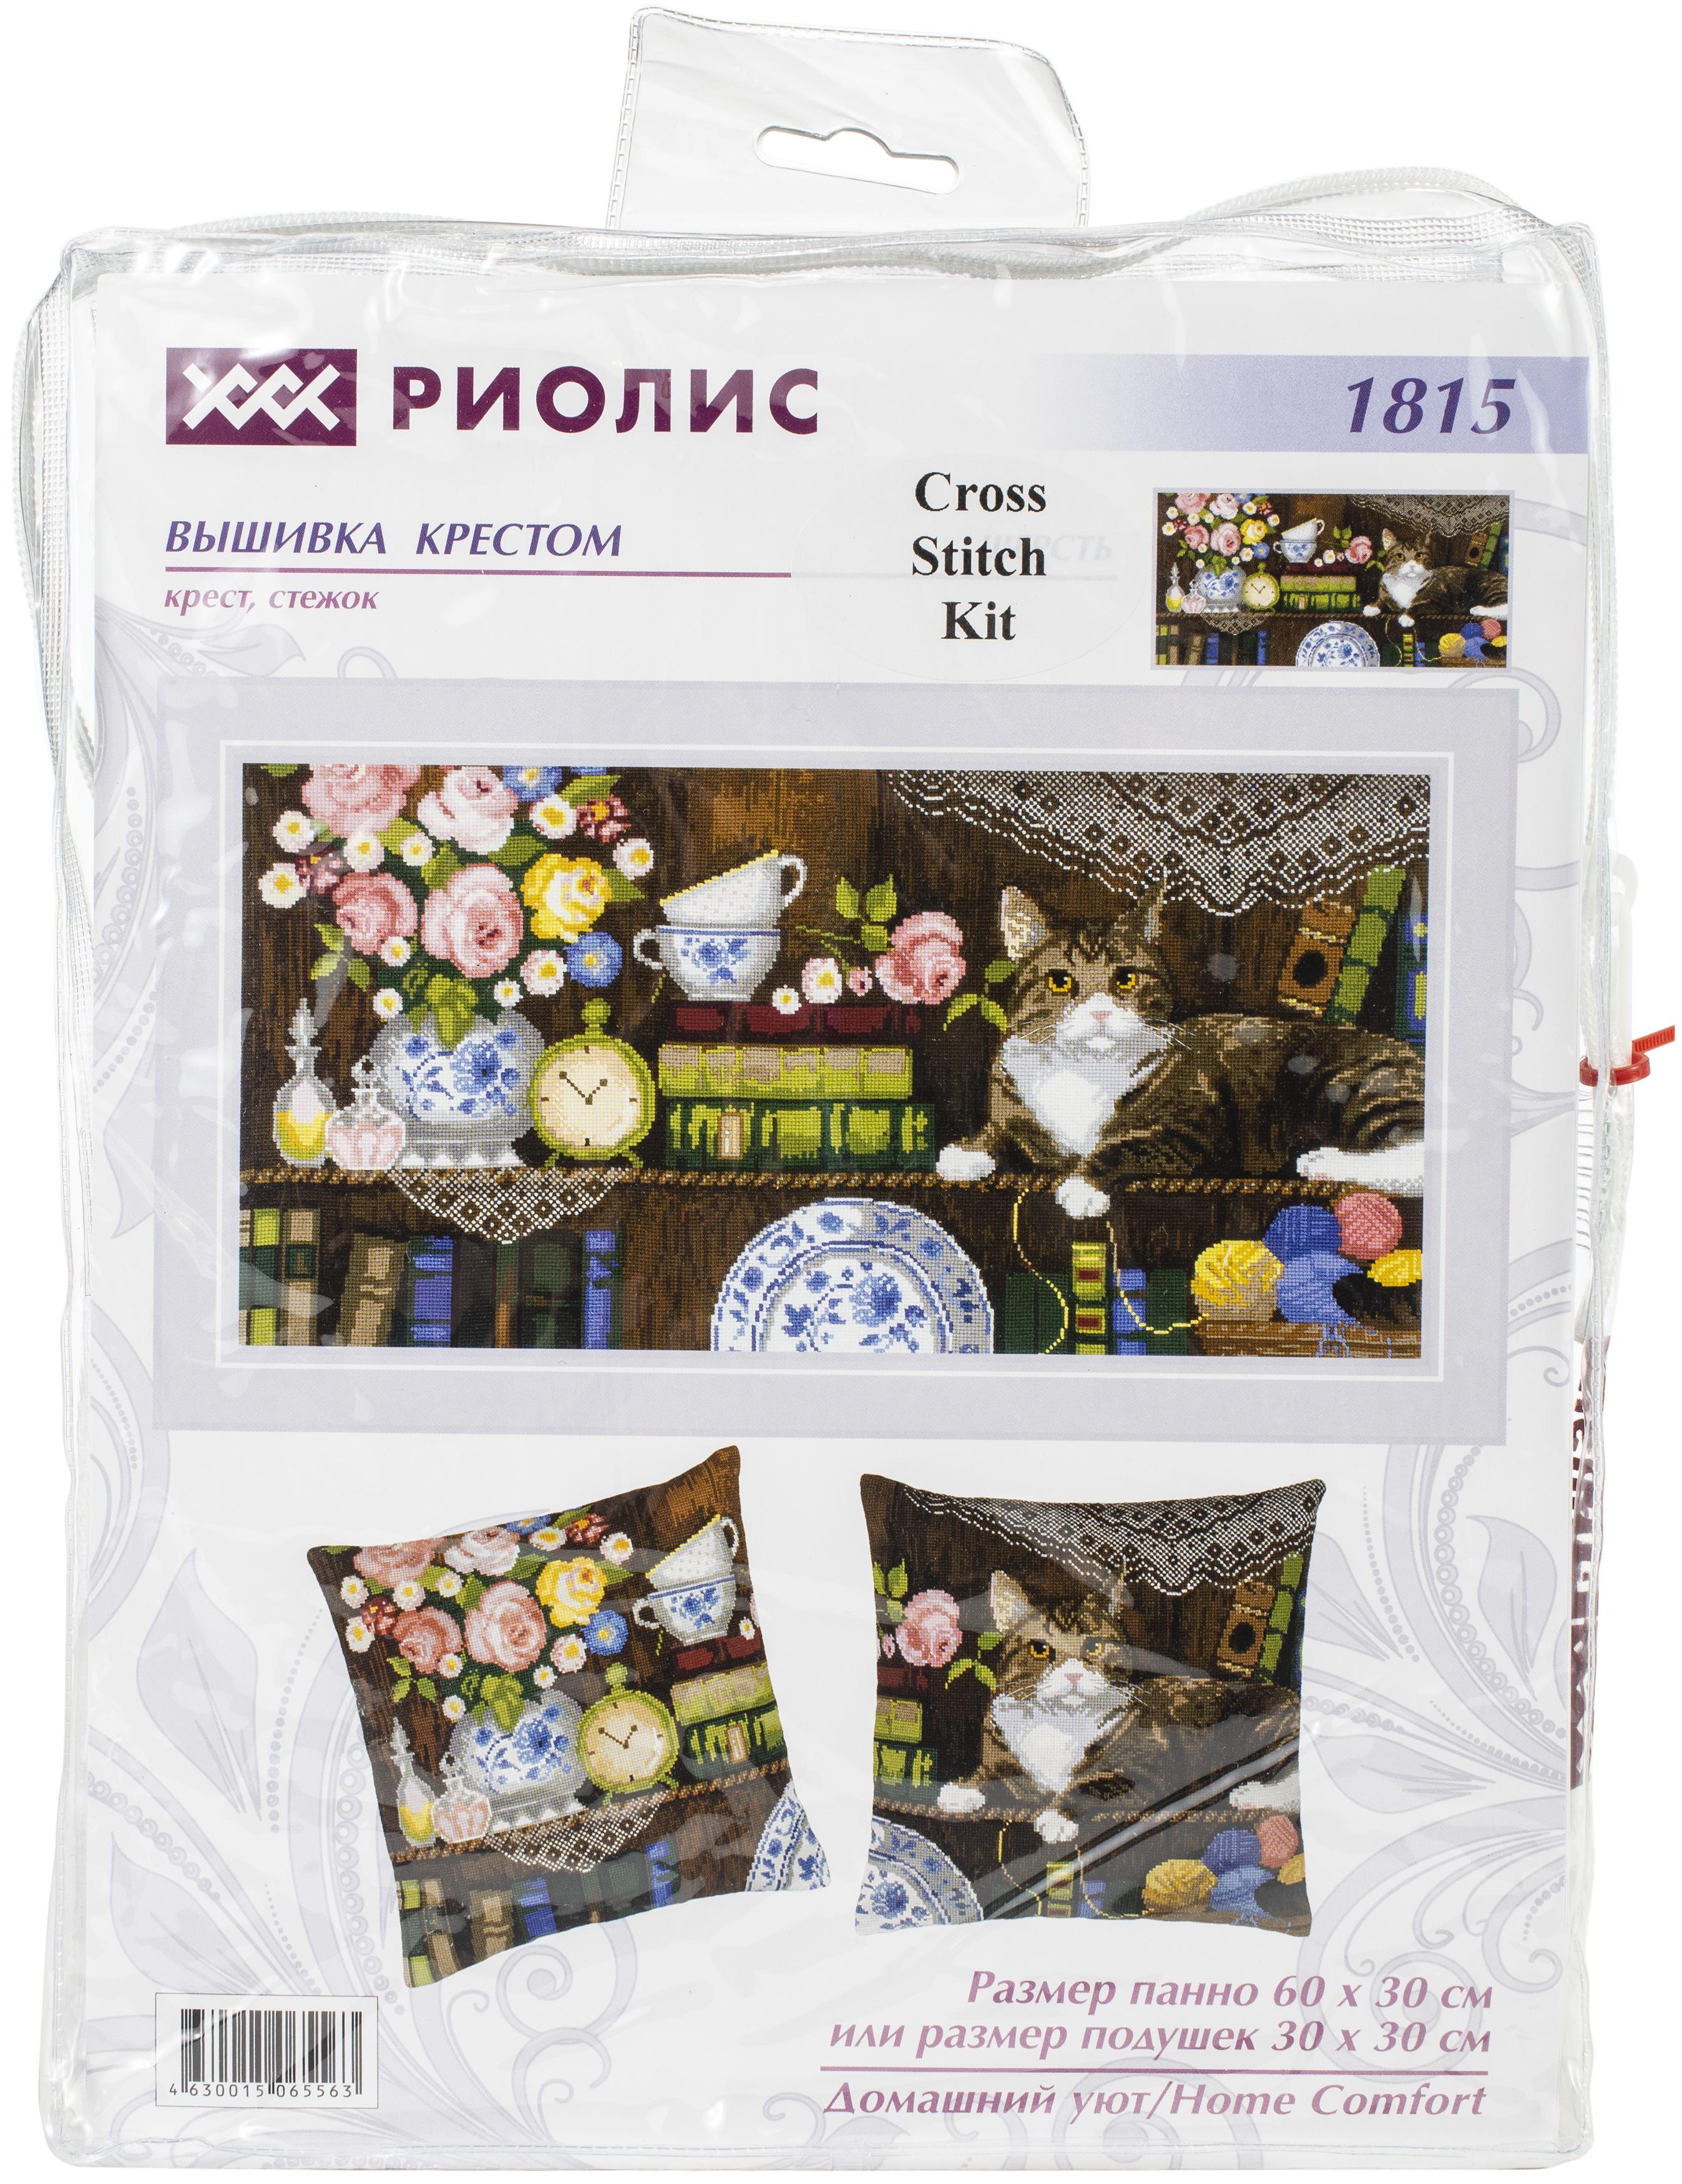 RIOLIS Counted Cross Stitch Kit 23.5X11.75-Panel/2 Cushions Home Comfort (14 C...